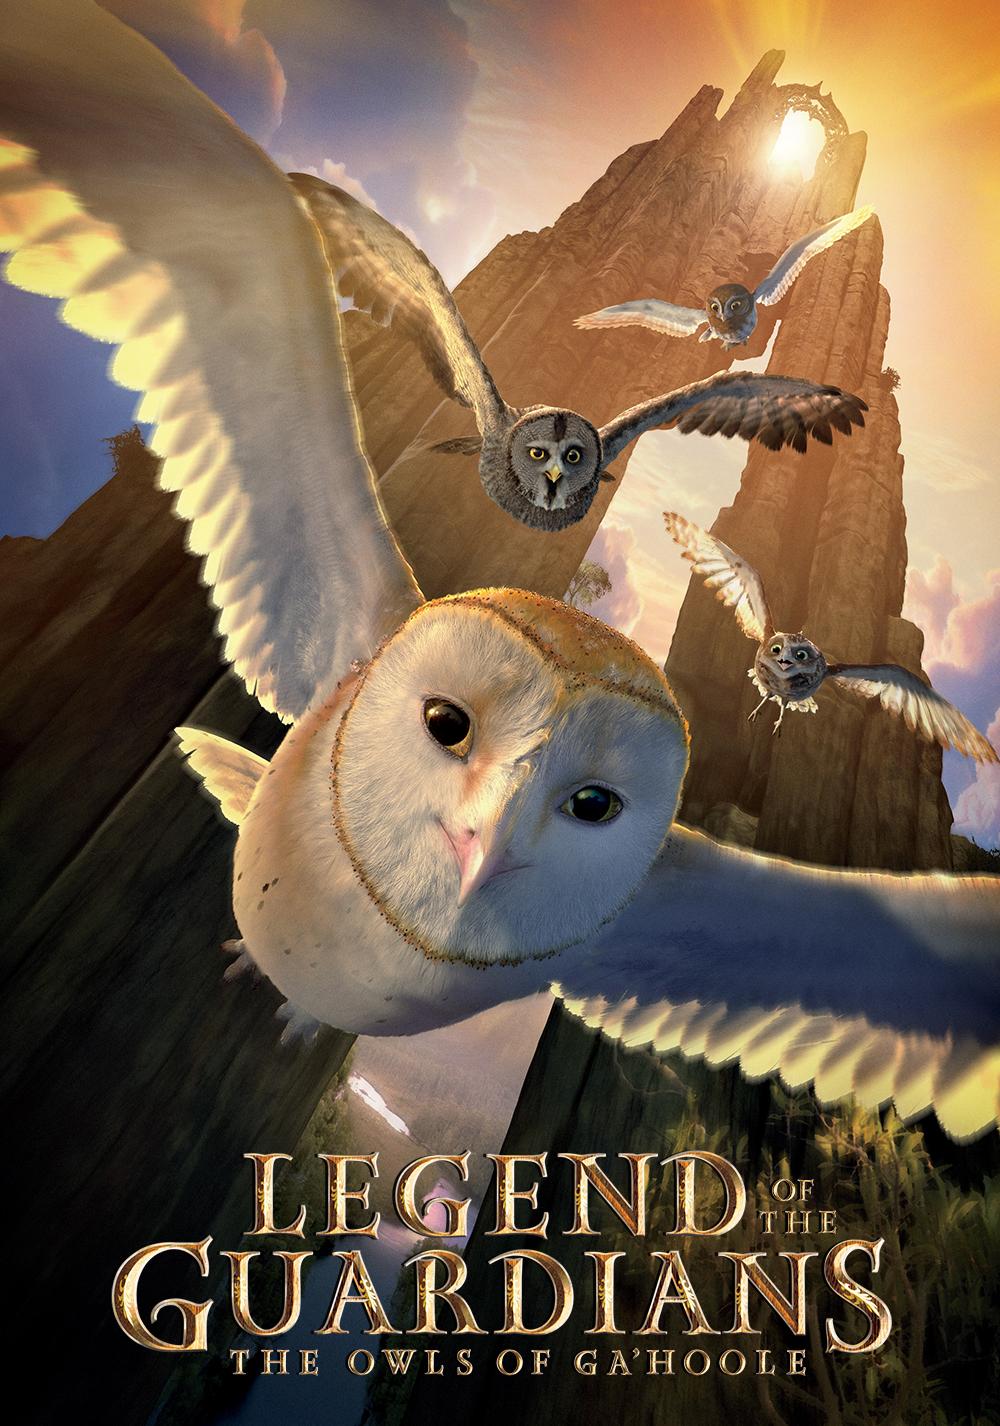 Legend of the Guardians: The Owls of Ga'Hoole Fanart